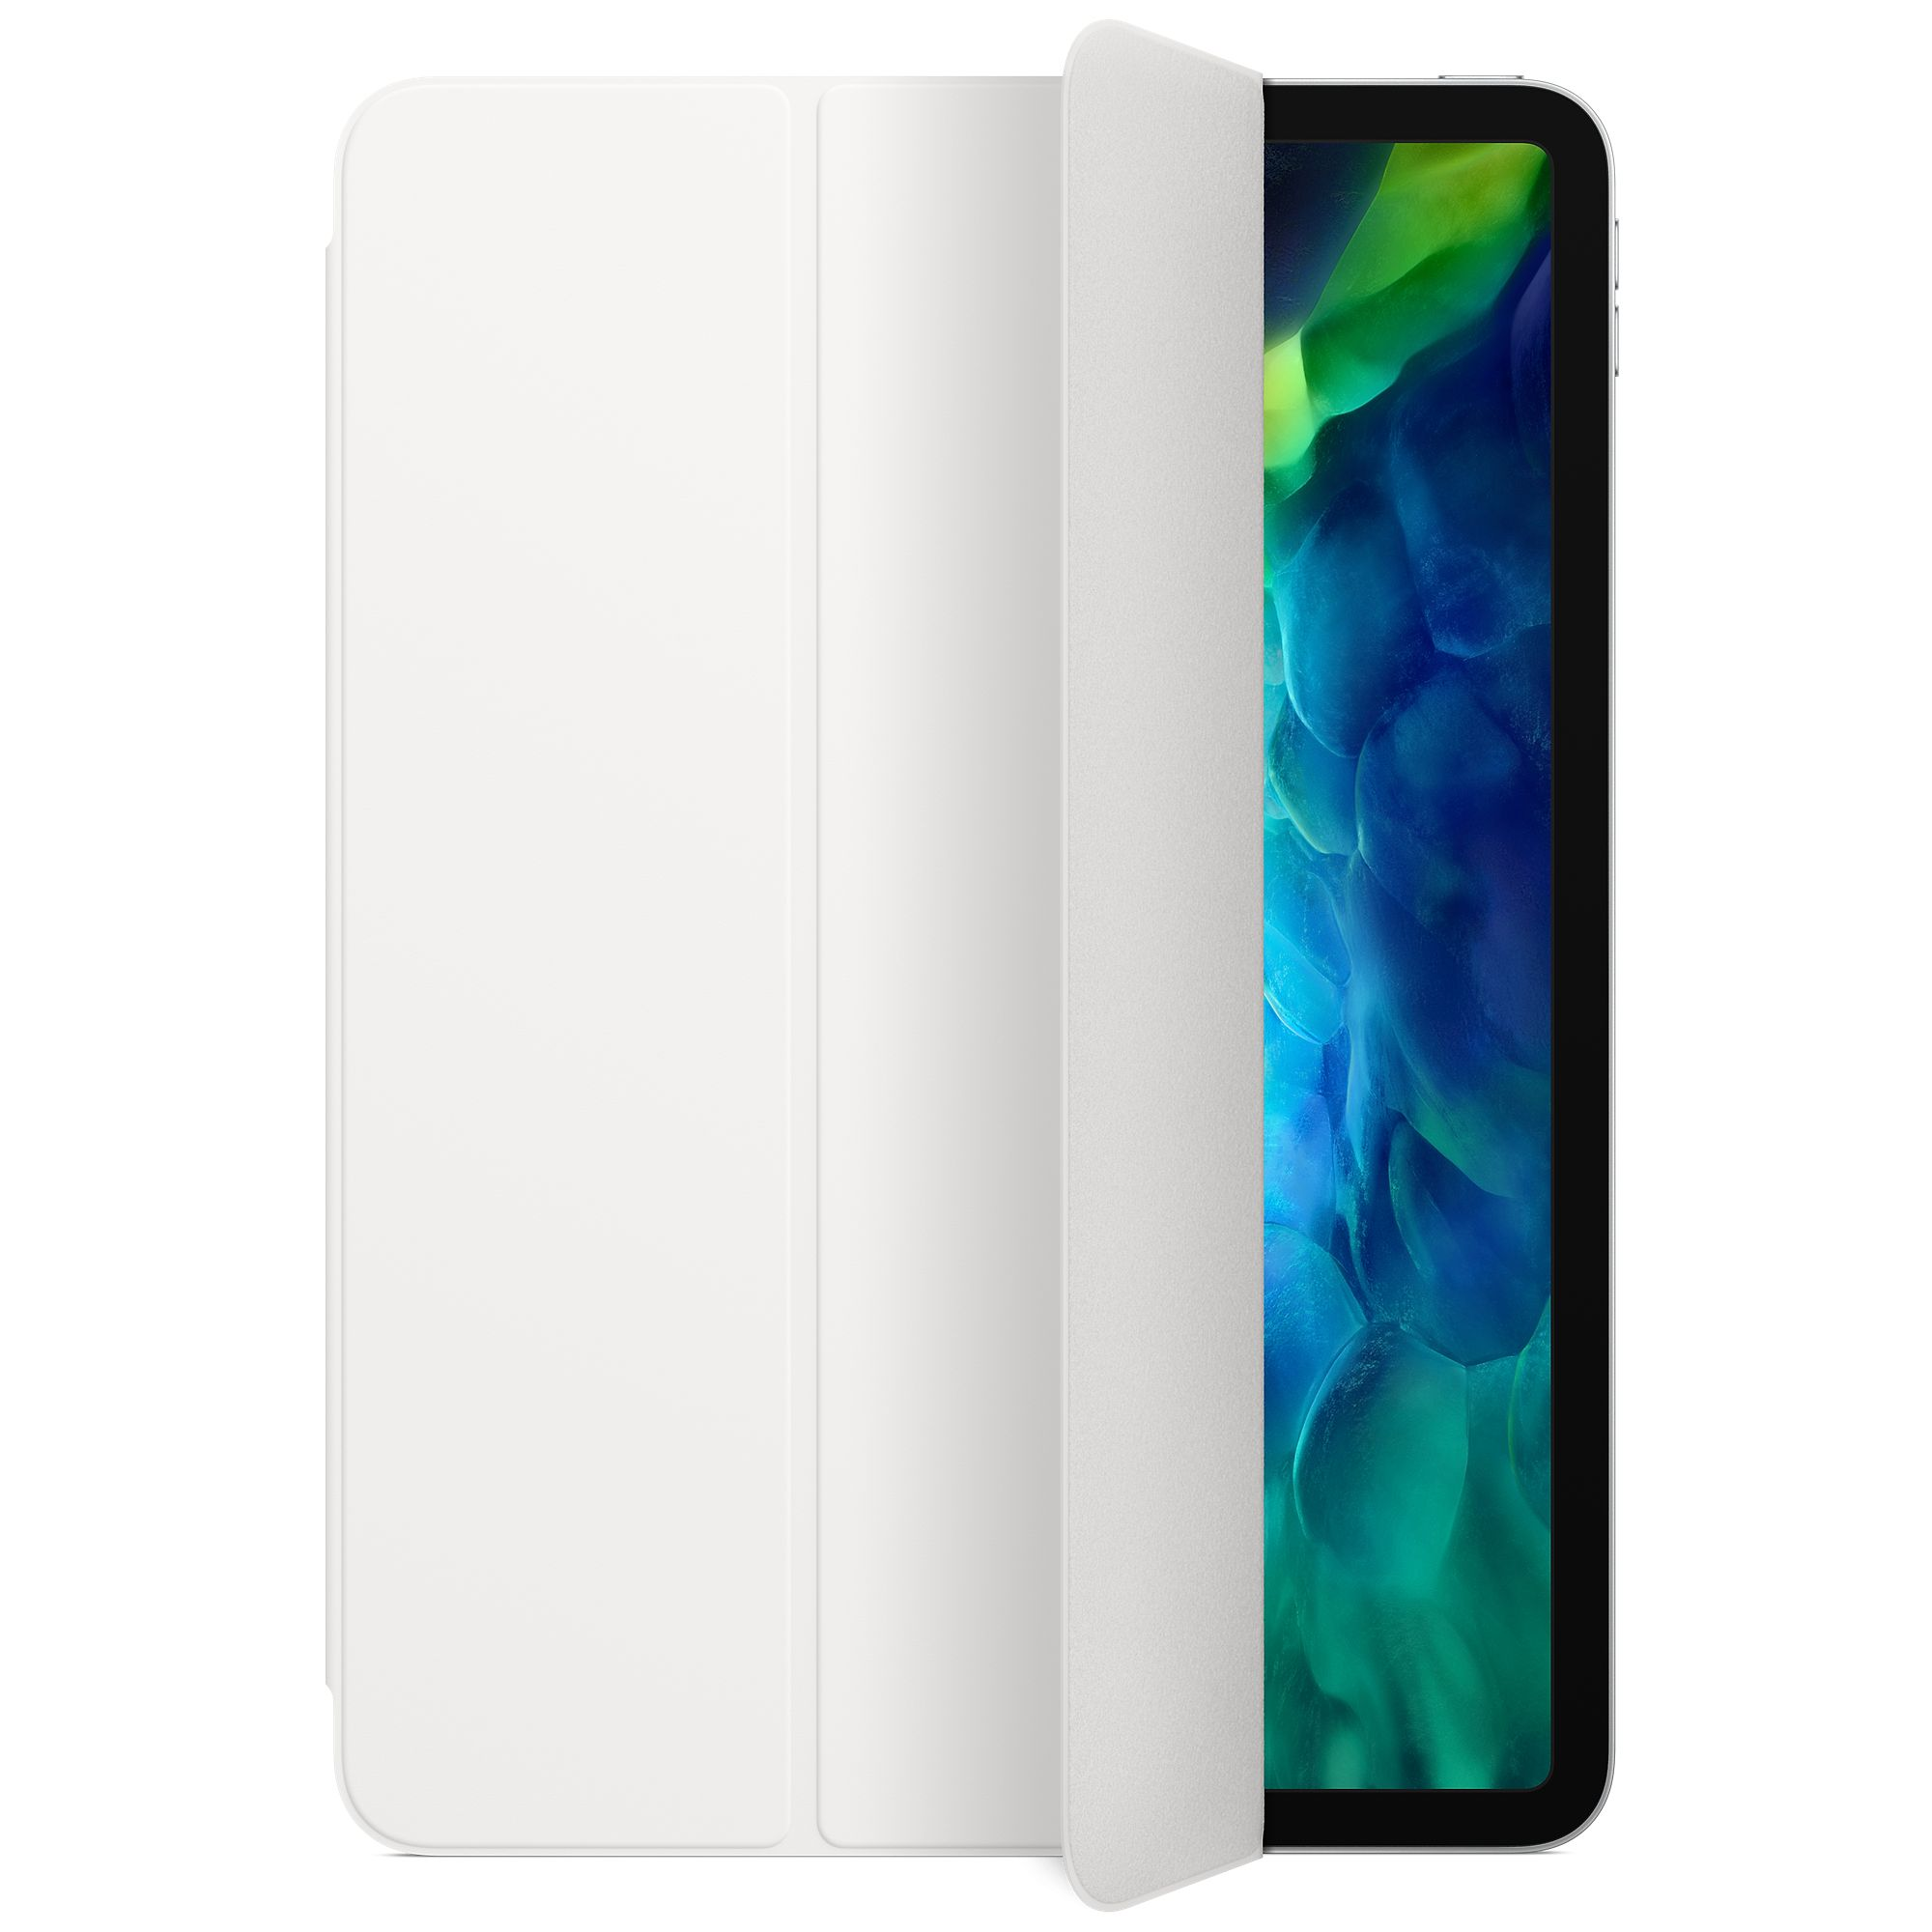 "Чехол Apple Smart Folio для iPad Pro 11"" White MXT32"